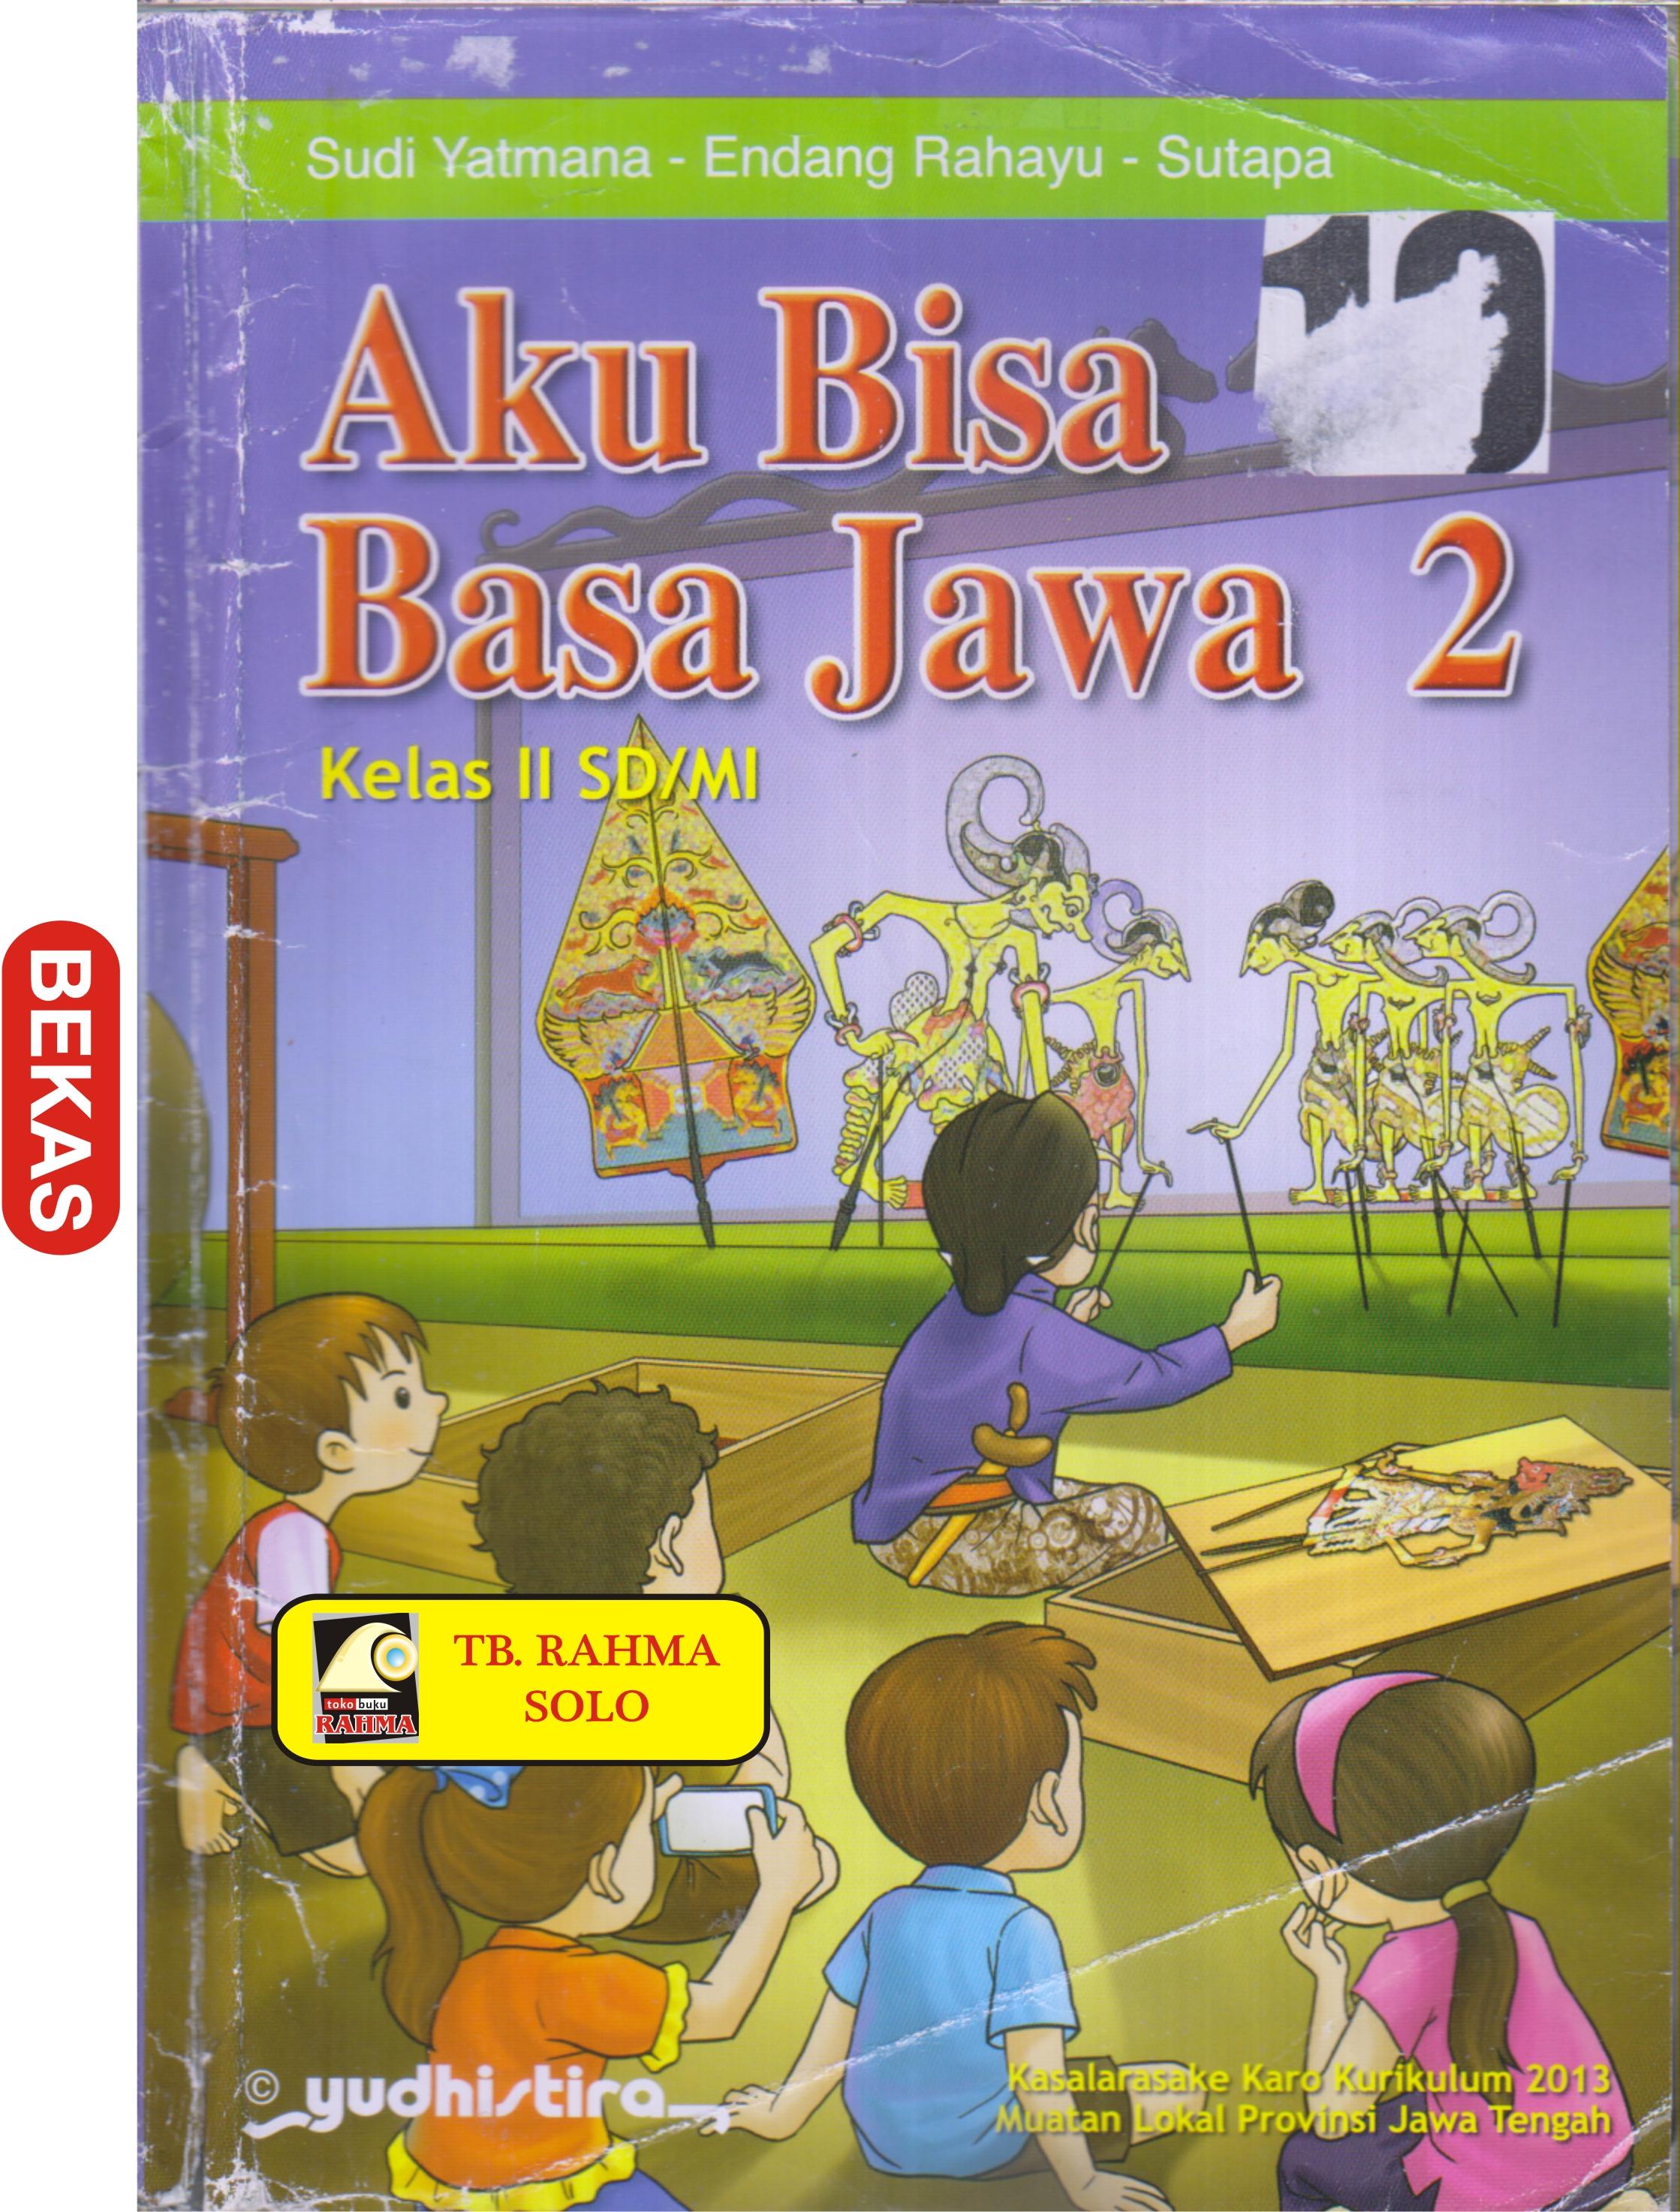 Inilah pembahasan lengkap terkait buku bahasa jawa kelas 3 sd yudhistira. Prigel Bahasa Jawa Kelas 10 Kemendikbud